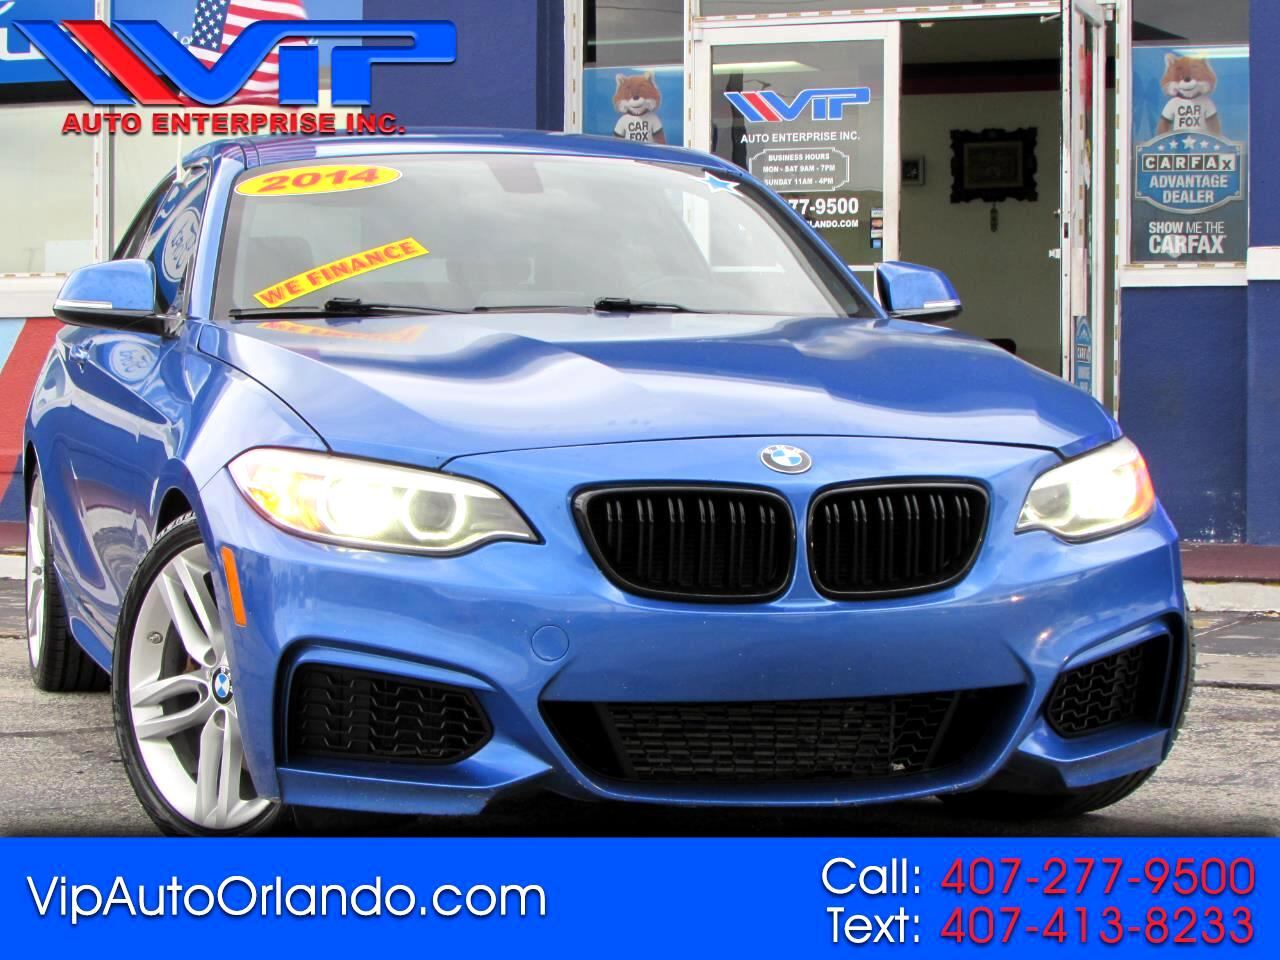 BMW 2 Series 2dr Cpe 228i RWD 2014